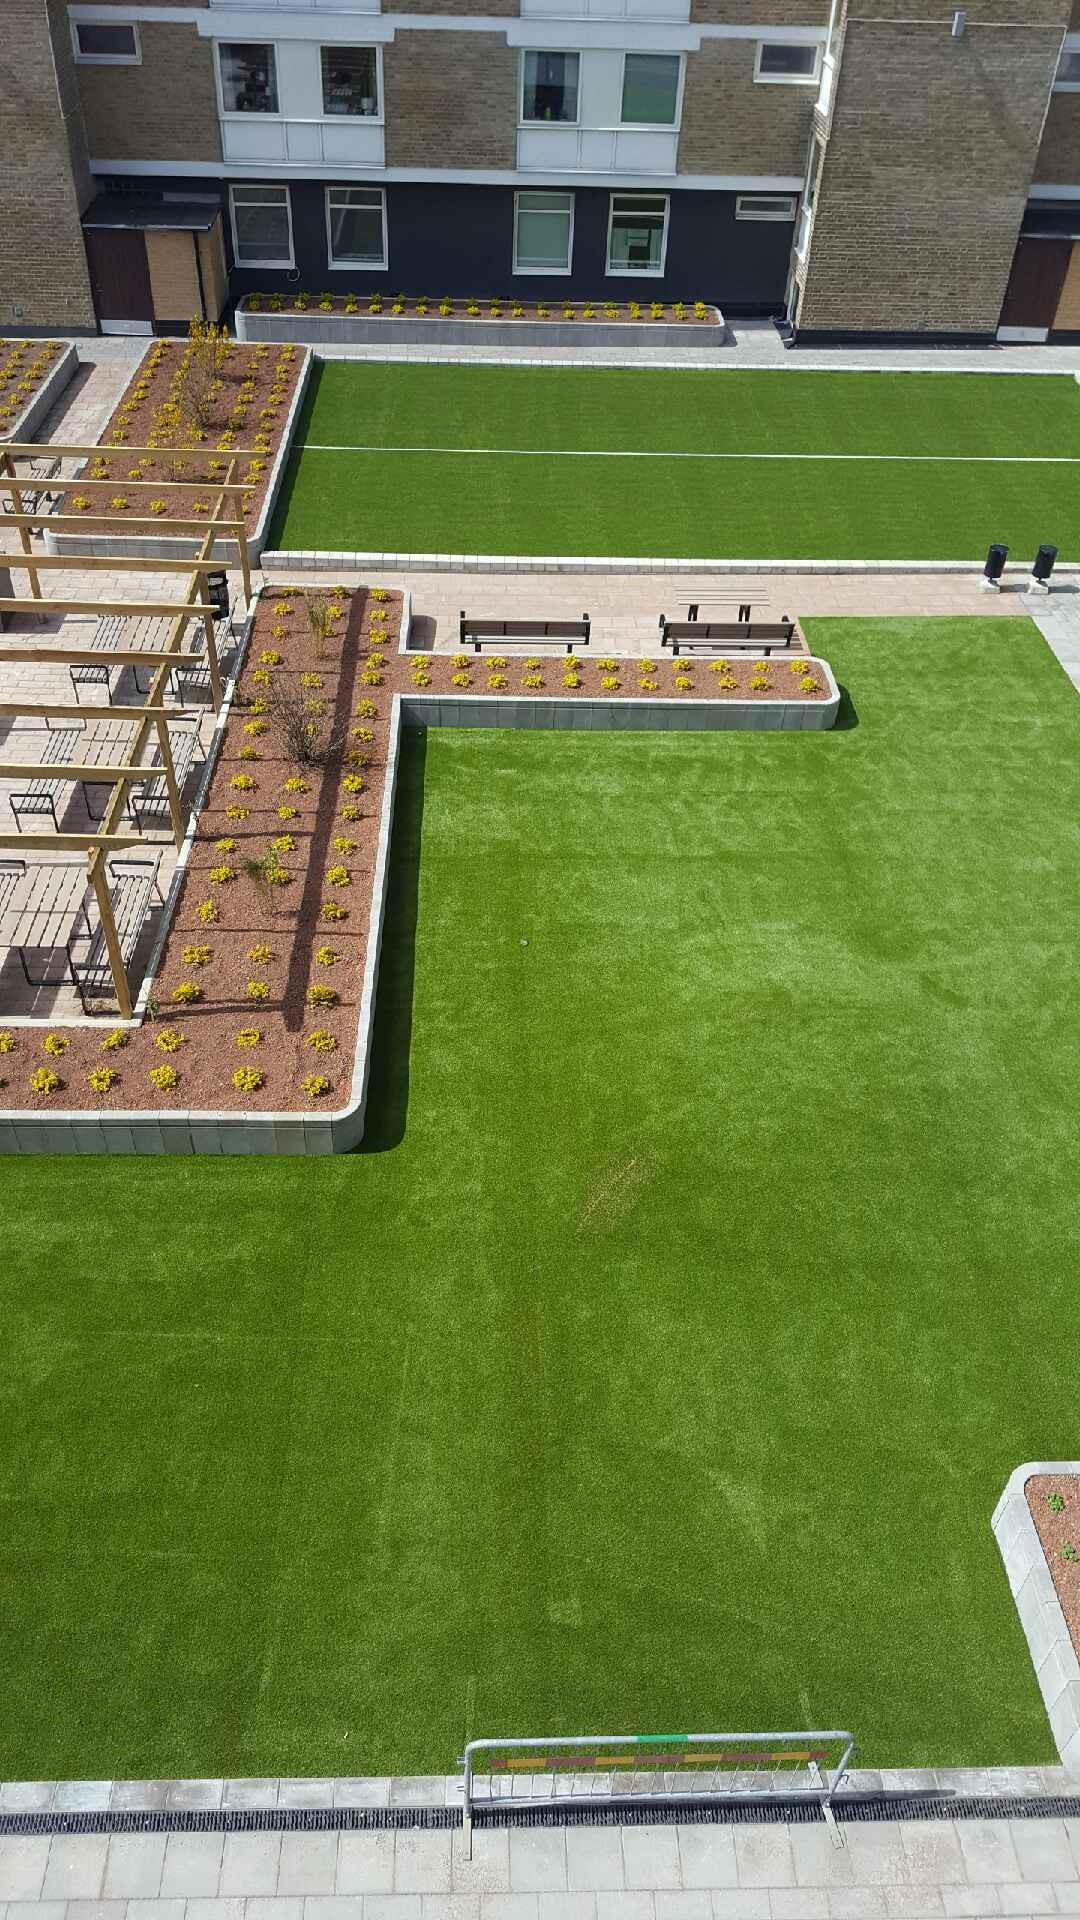 Unisport tekonurmi piha-alue vihernurmi